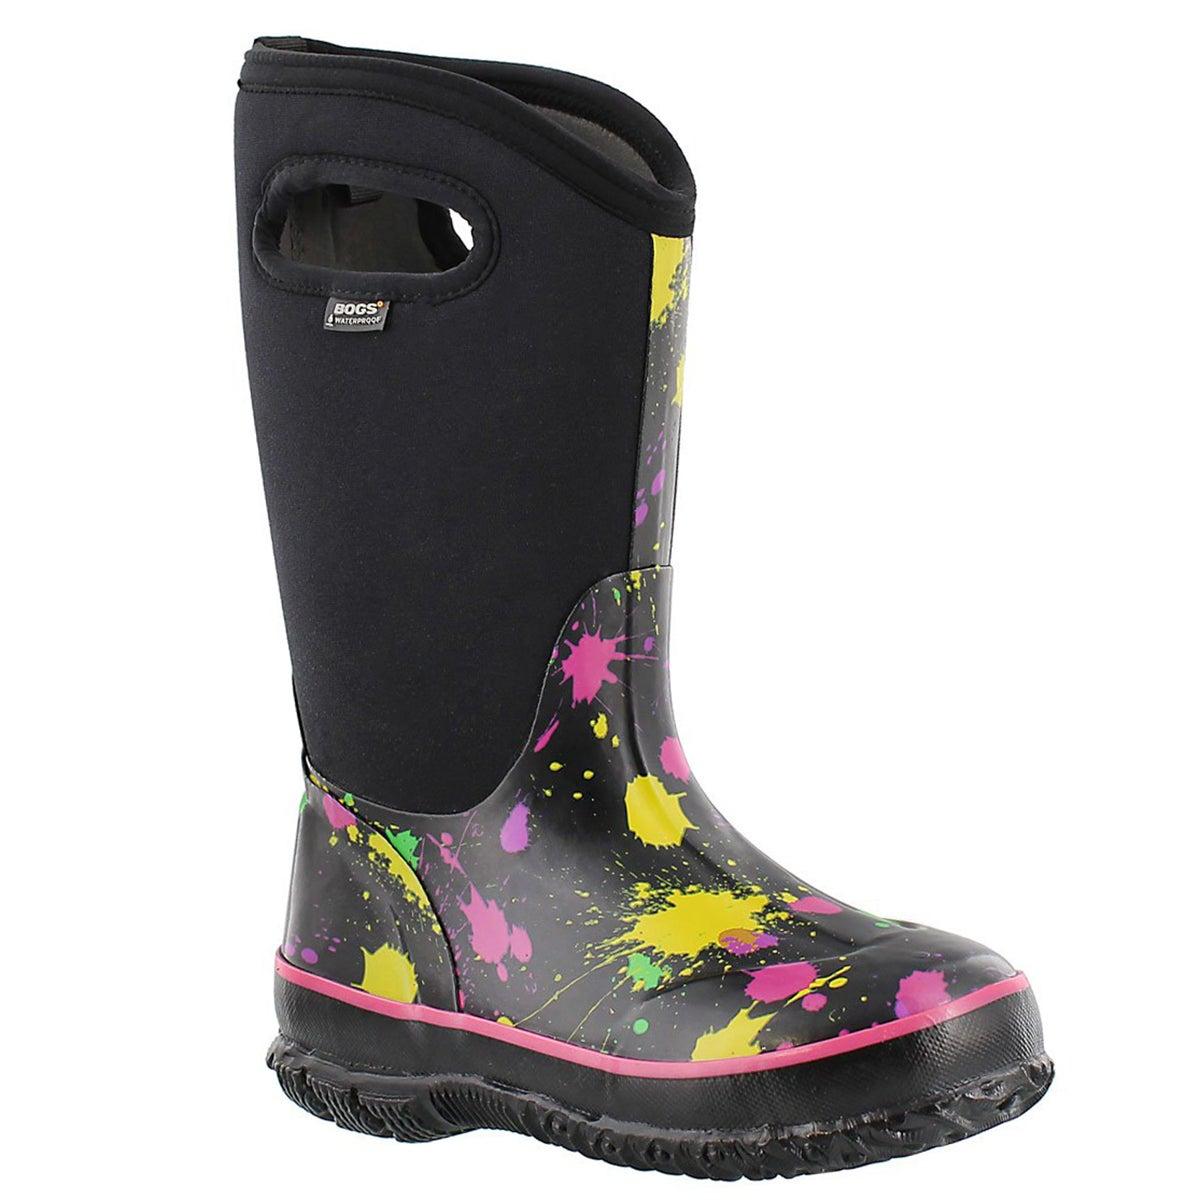 Grls Paint Splat tall blk/pink boot